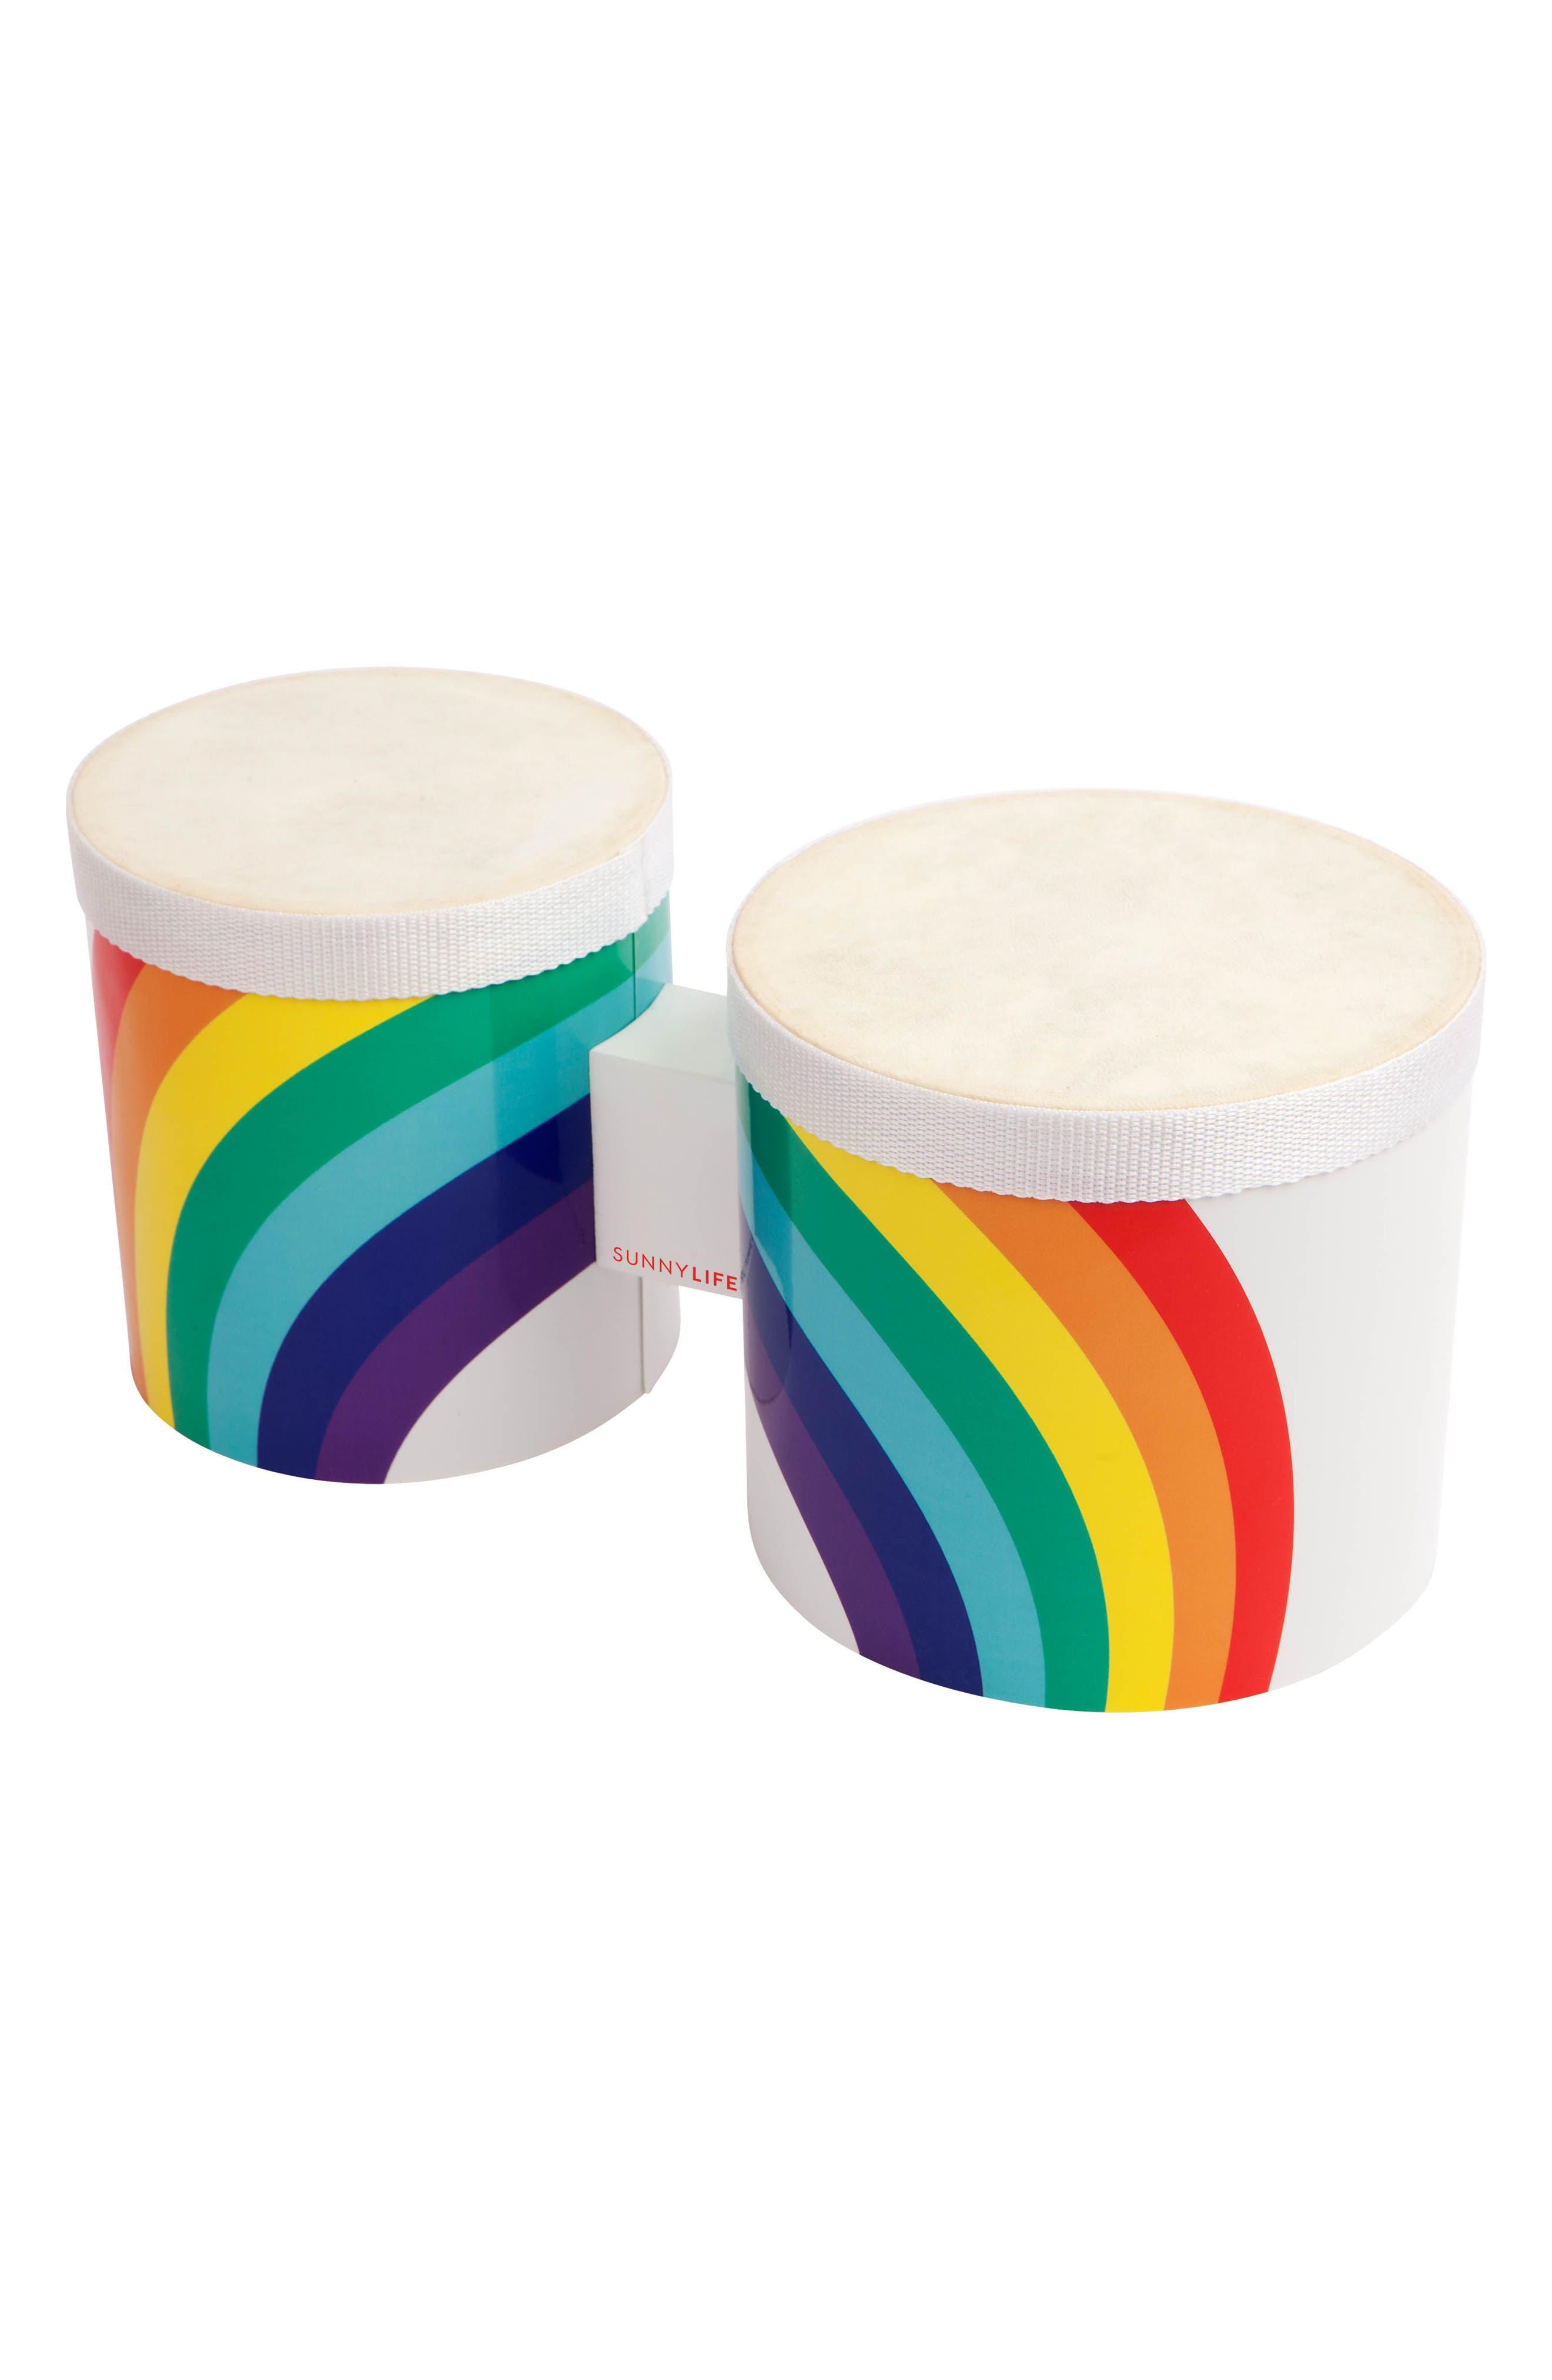 Rainbow Bongo Drums,                             Main thumbnail 1, color,                             Multi